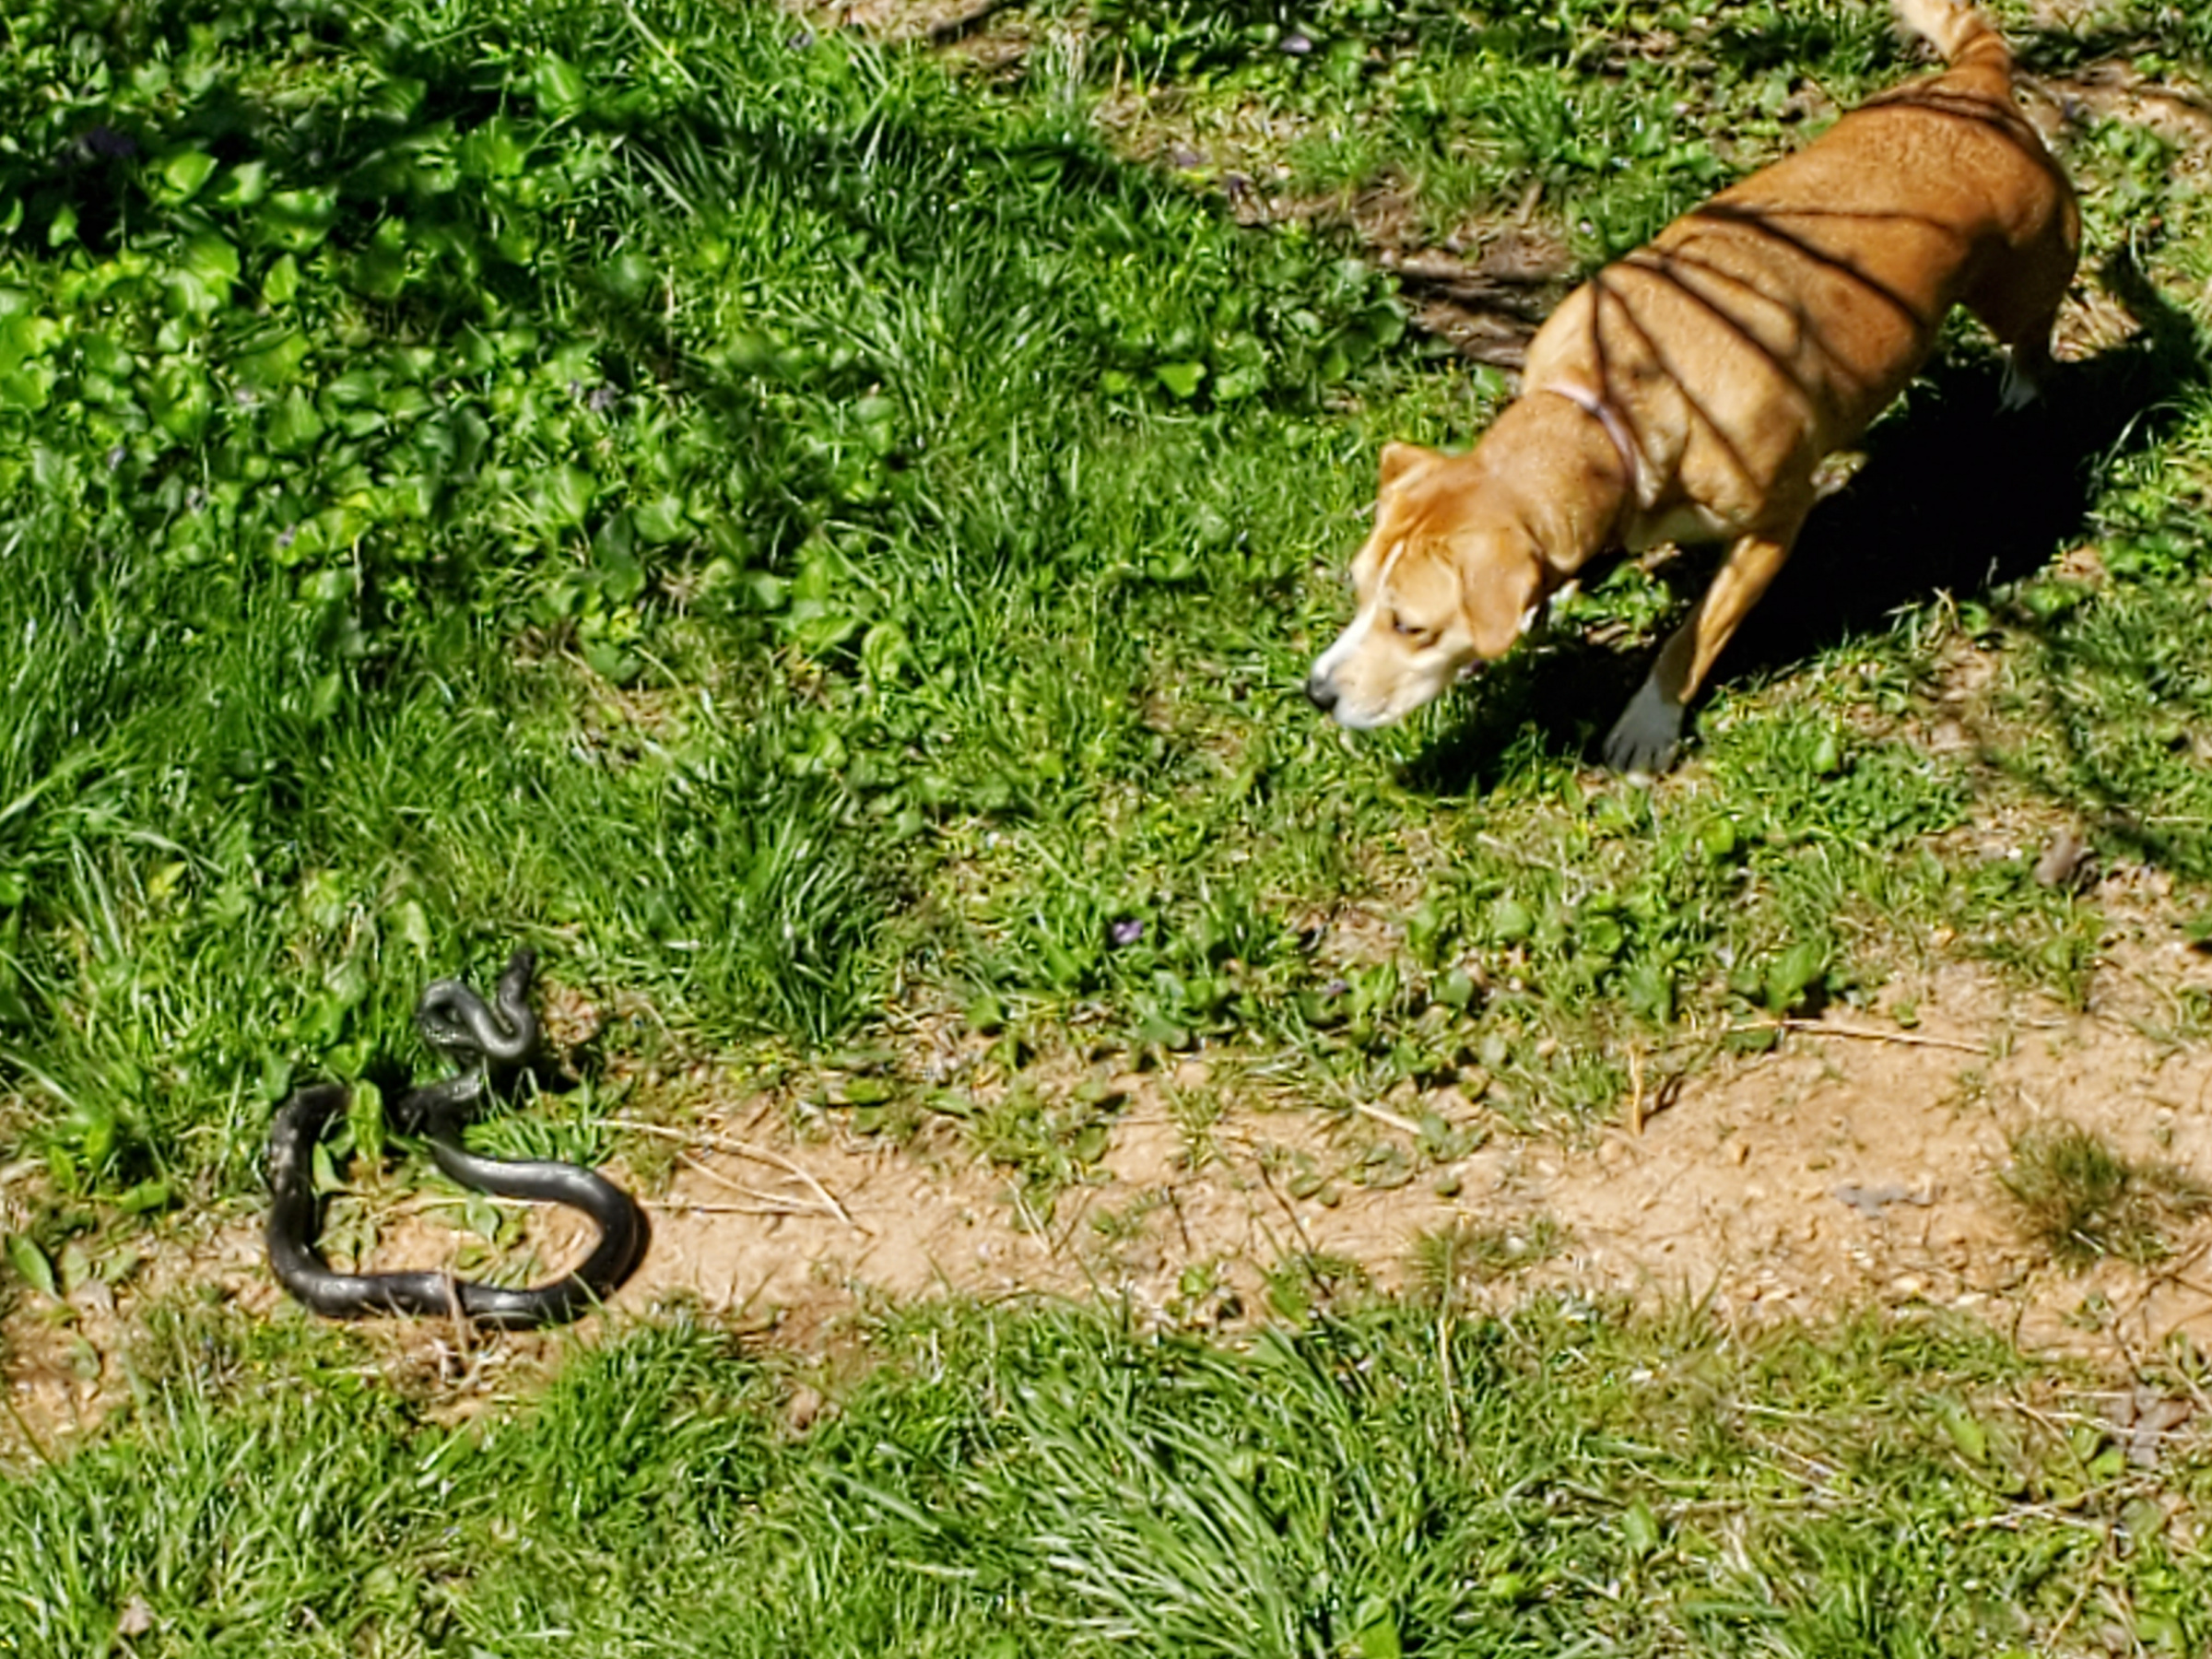 Catching a snake-20200405_113005.jpg